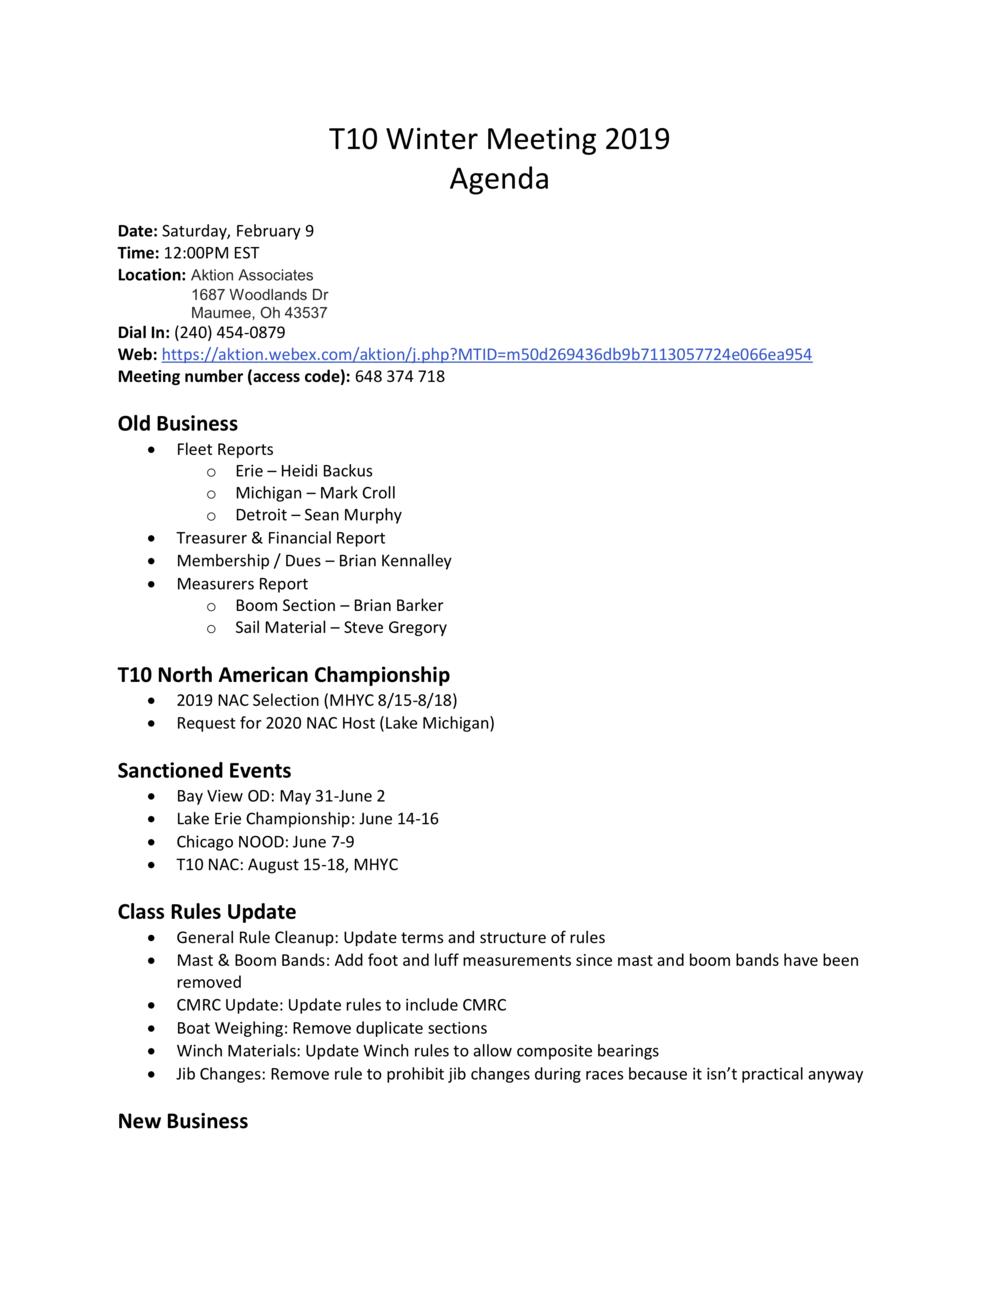 2019 T10 Winter Meeting AgendaV2.png